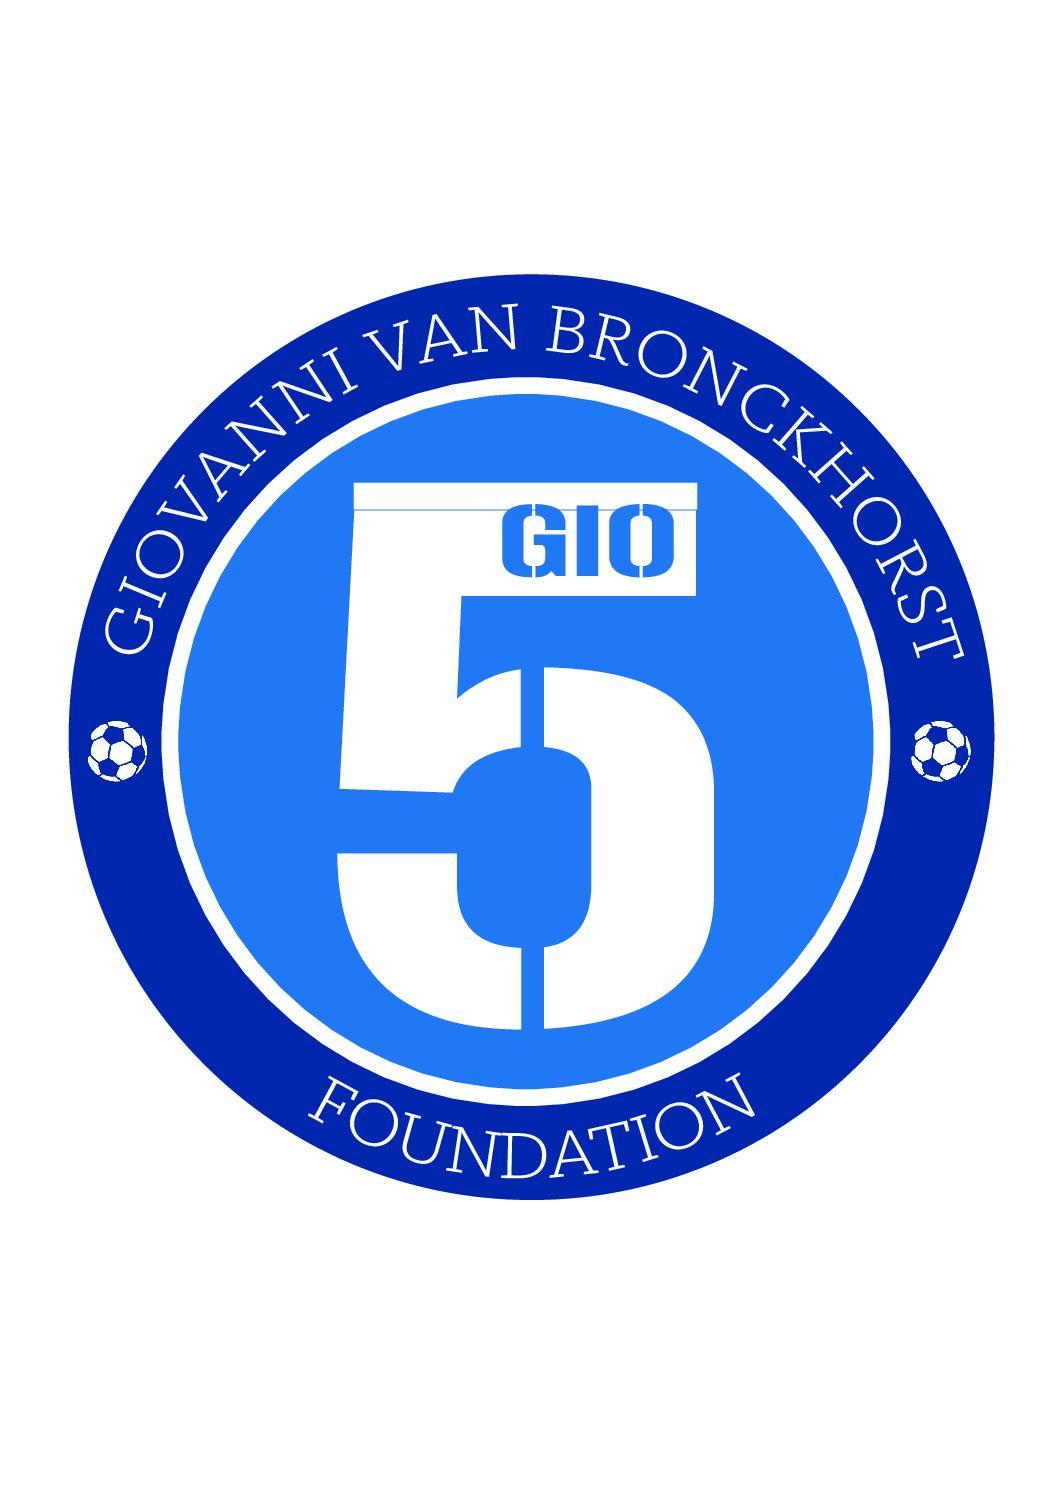 Giovanni van Bronckhorst Foundation